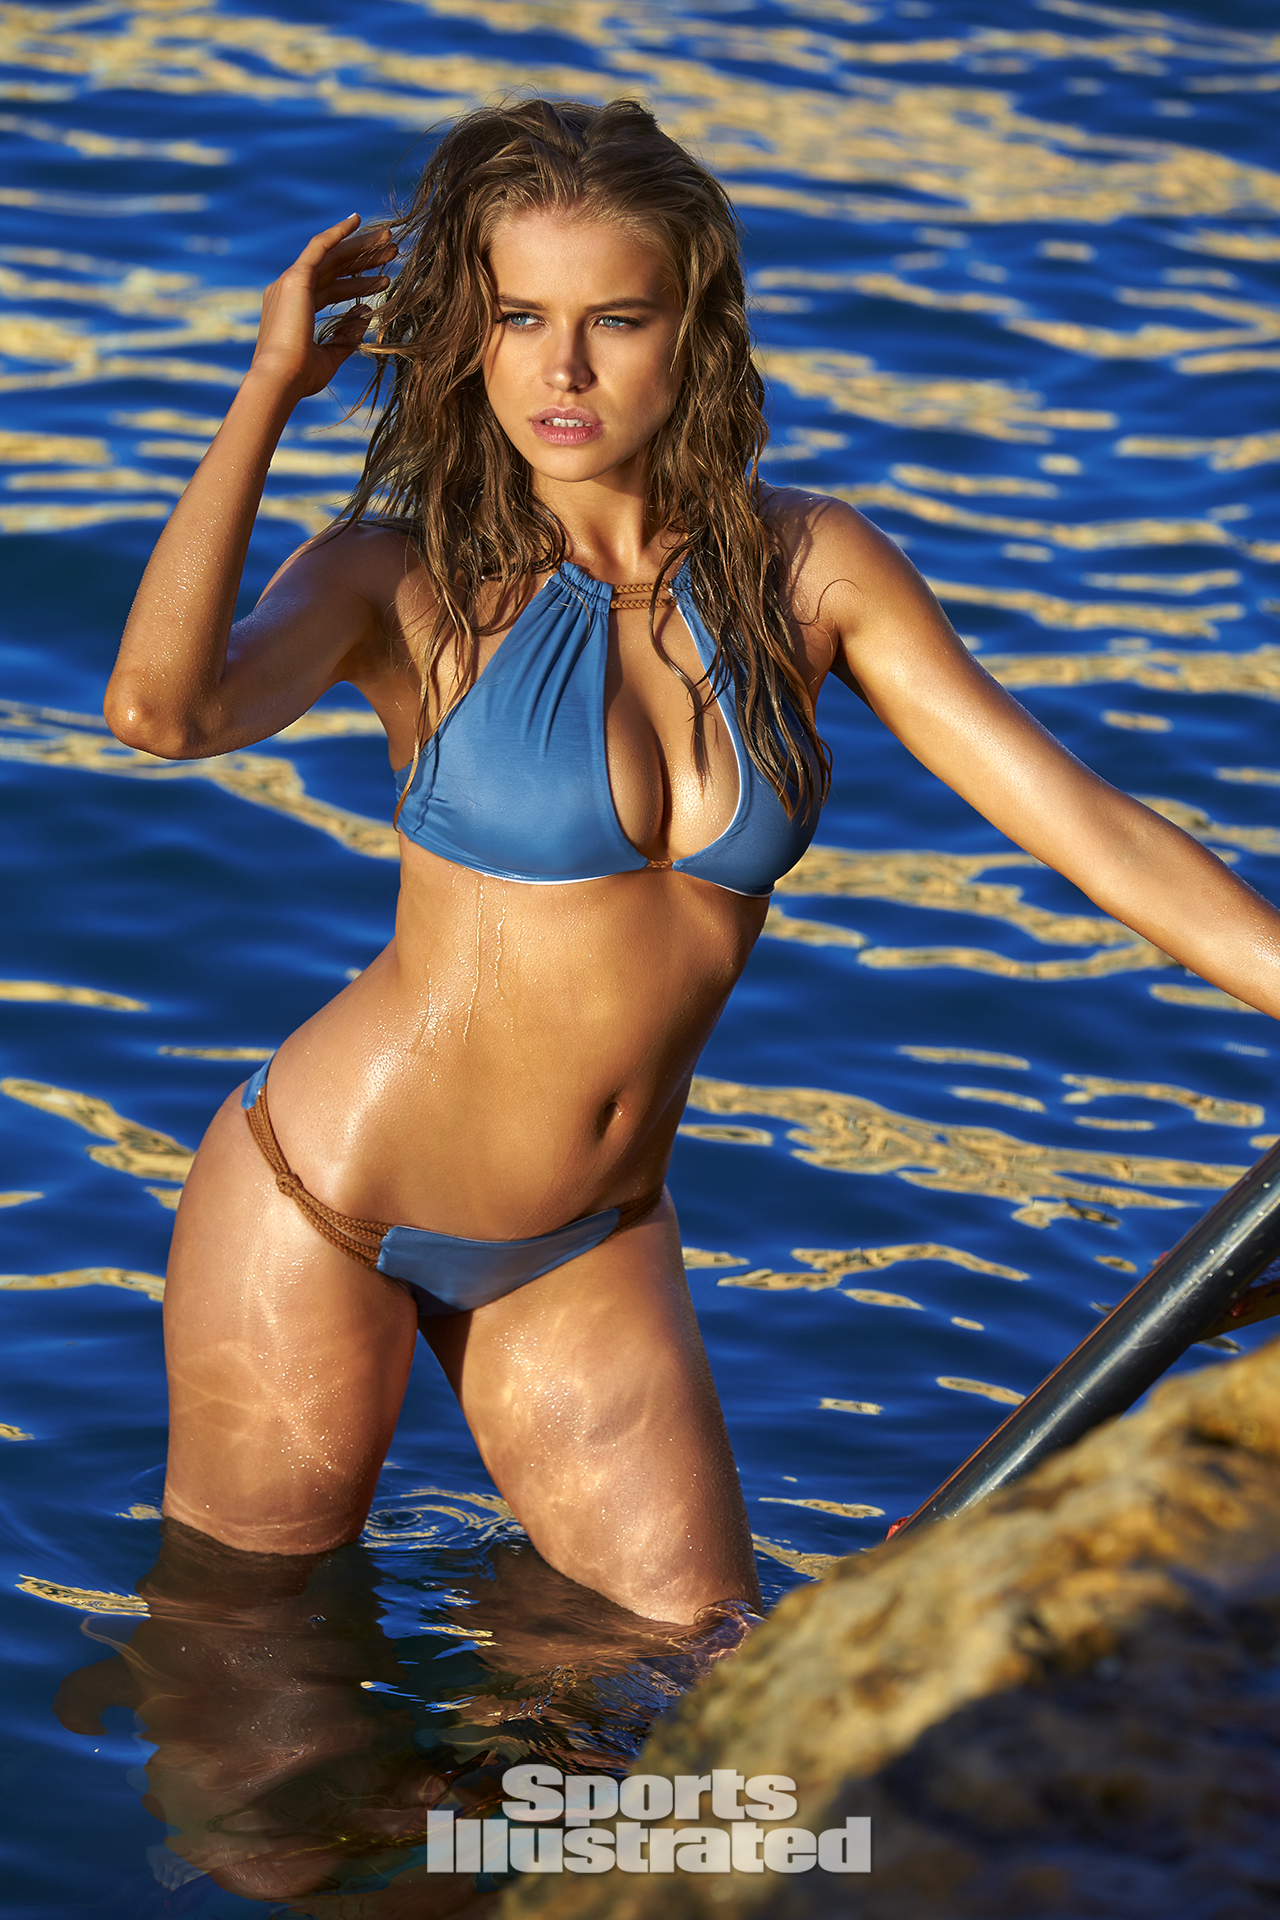 40432f19b7 Tanya Mityushina was photographed by Ben Watts in Malta. Swimsuit by KOA  Swim.